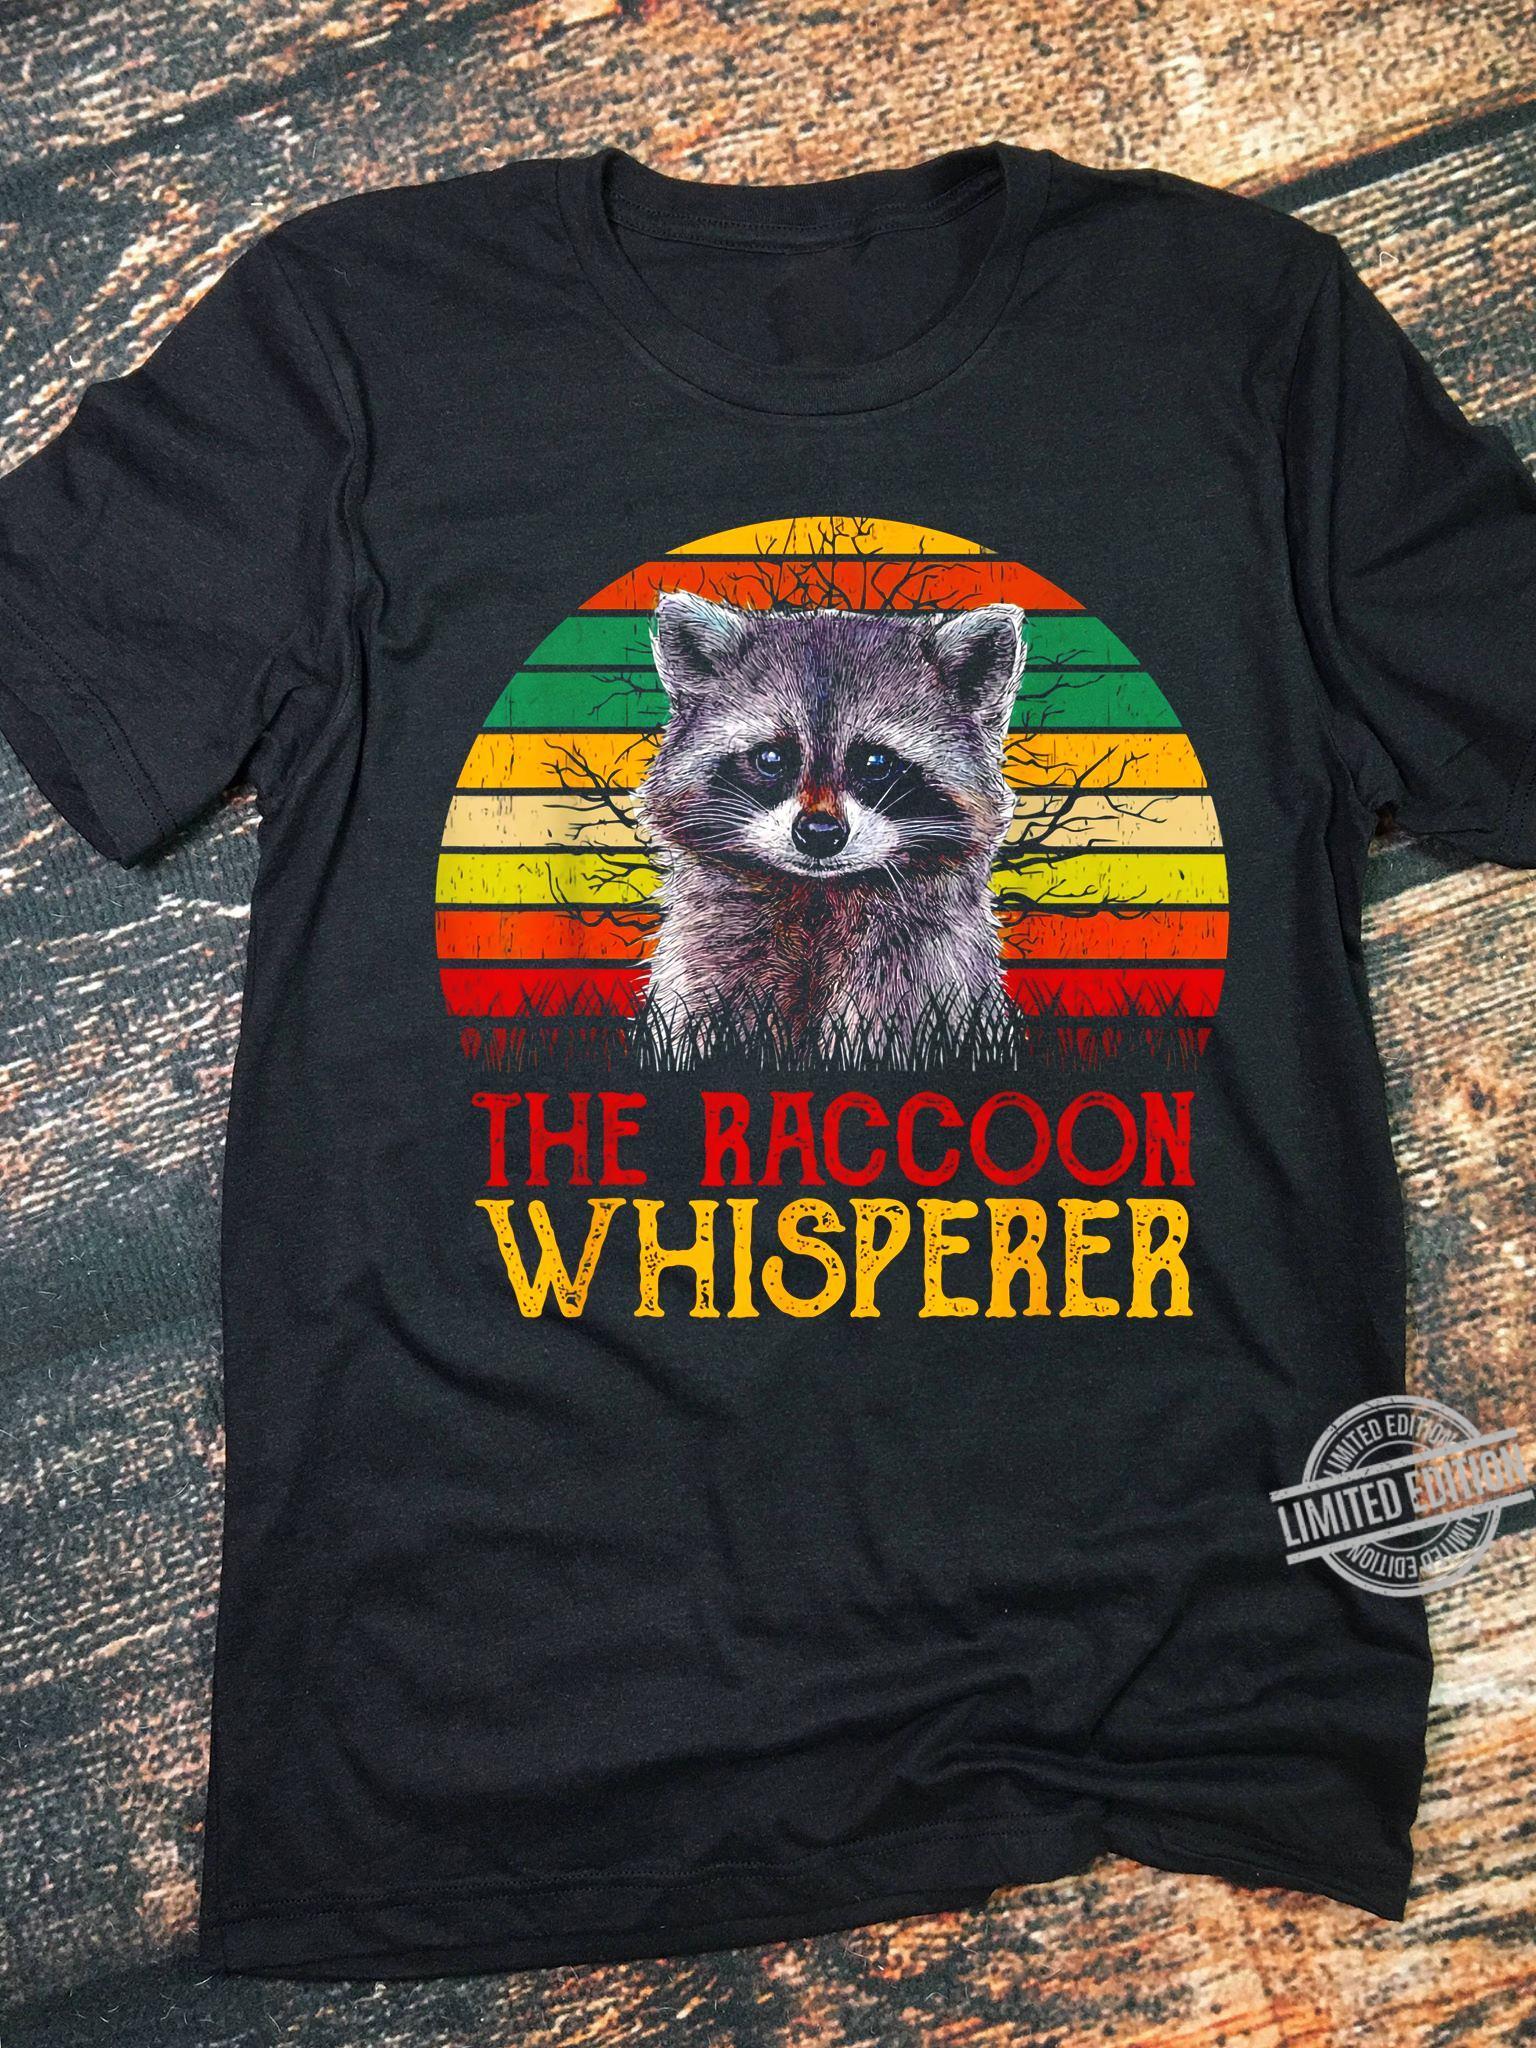 The Raccoon Whisperer Women T-Shirt